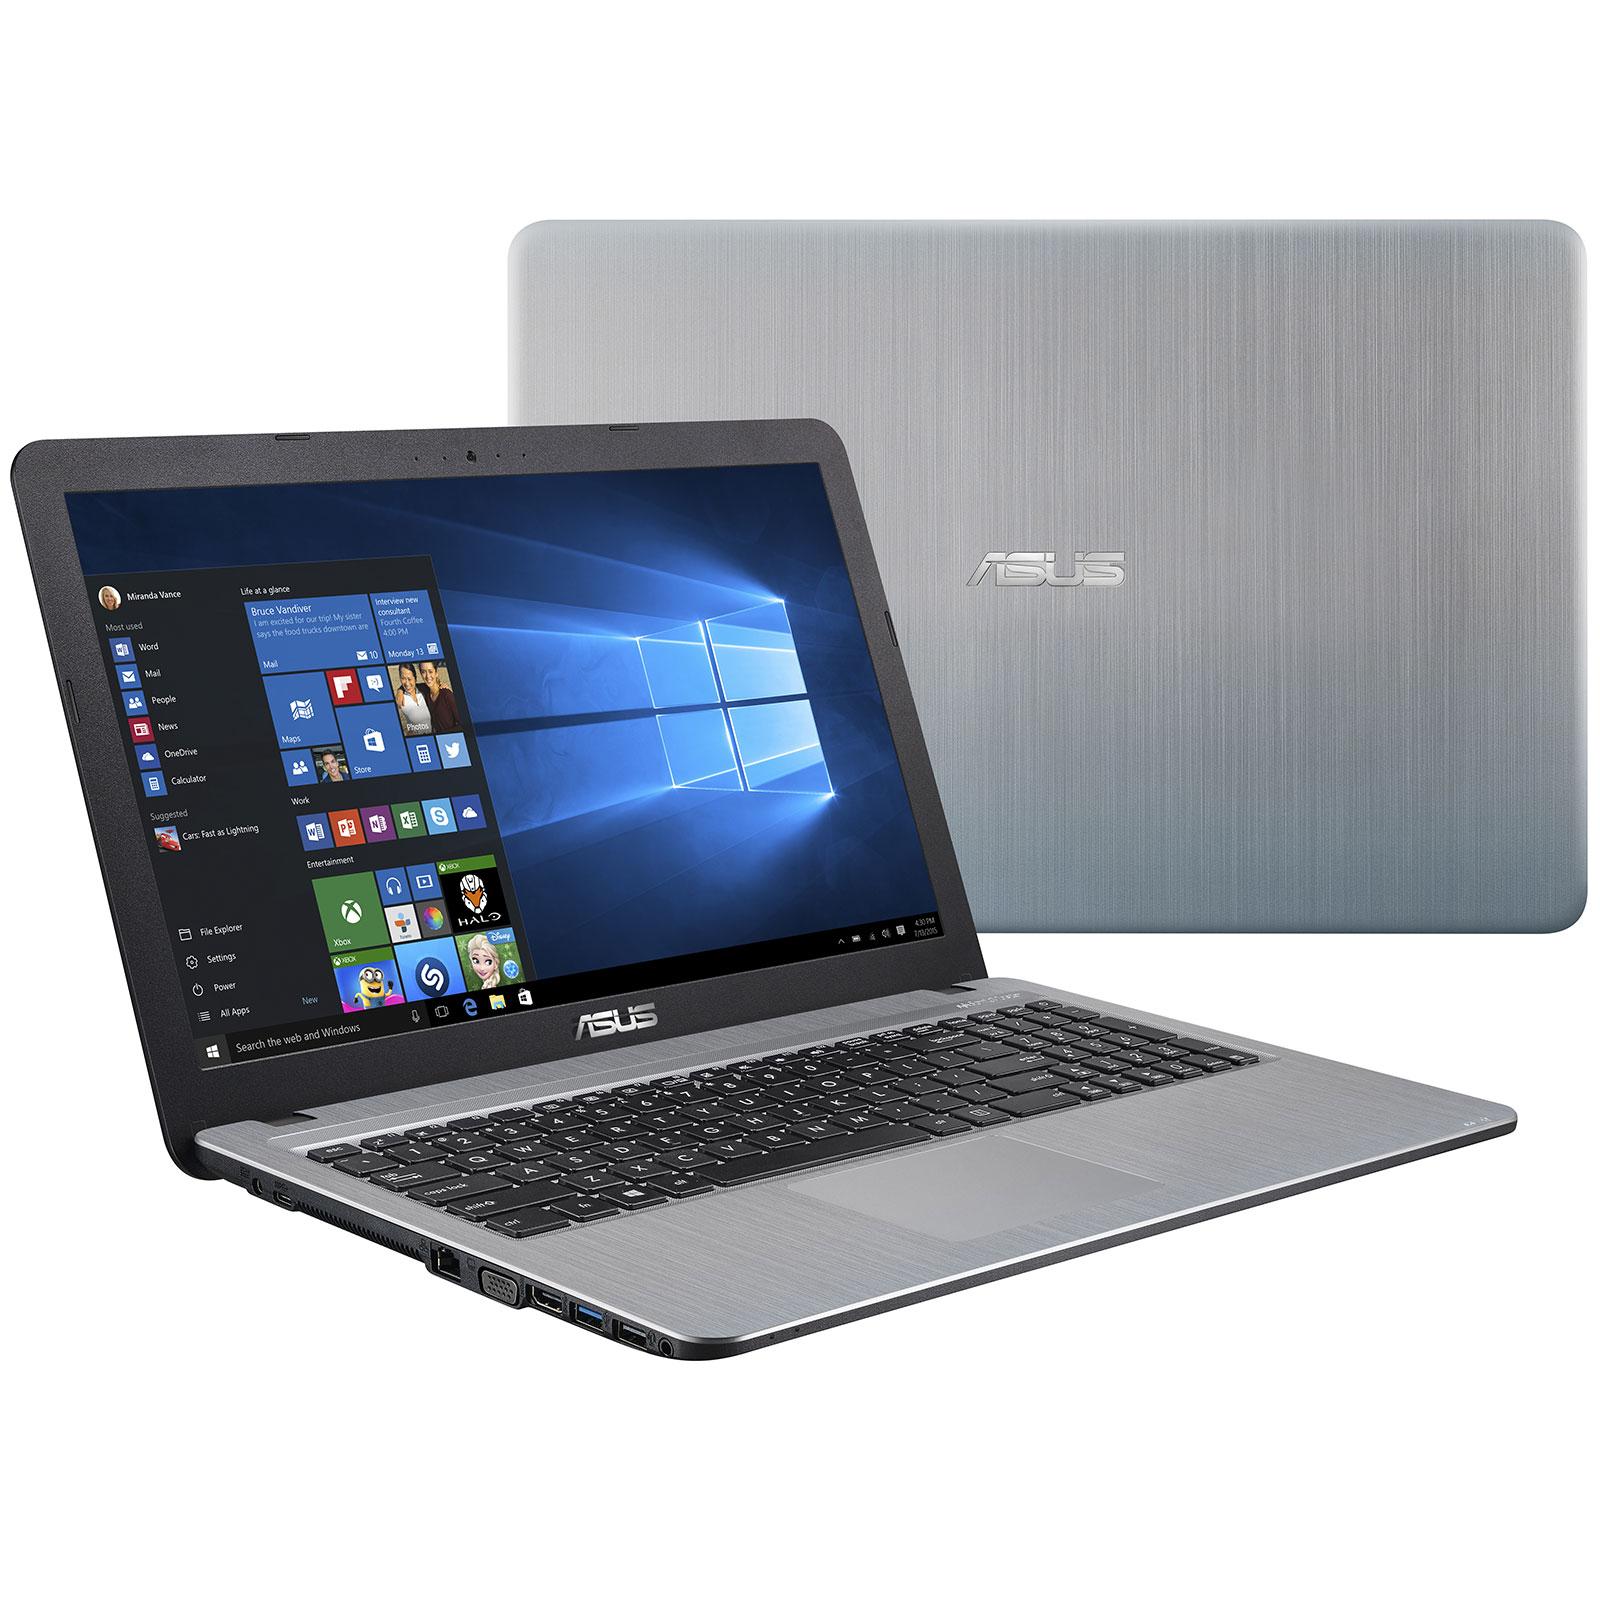 "PC portable ASUS R541UV-DM255T Intel Core i5-6198DU 4 Go 1 To 15.6"" LED Full HD NVIDIA GeForce 920MX Graveur DVD Wi-Fi N/Bluetooth Webcam Windows 10 Famille 64 bits (garantie constructeur 2 ans)"